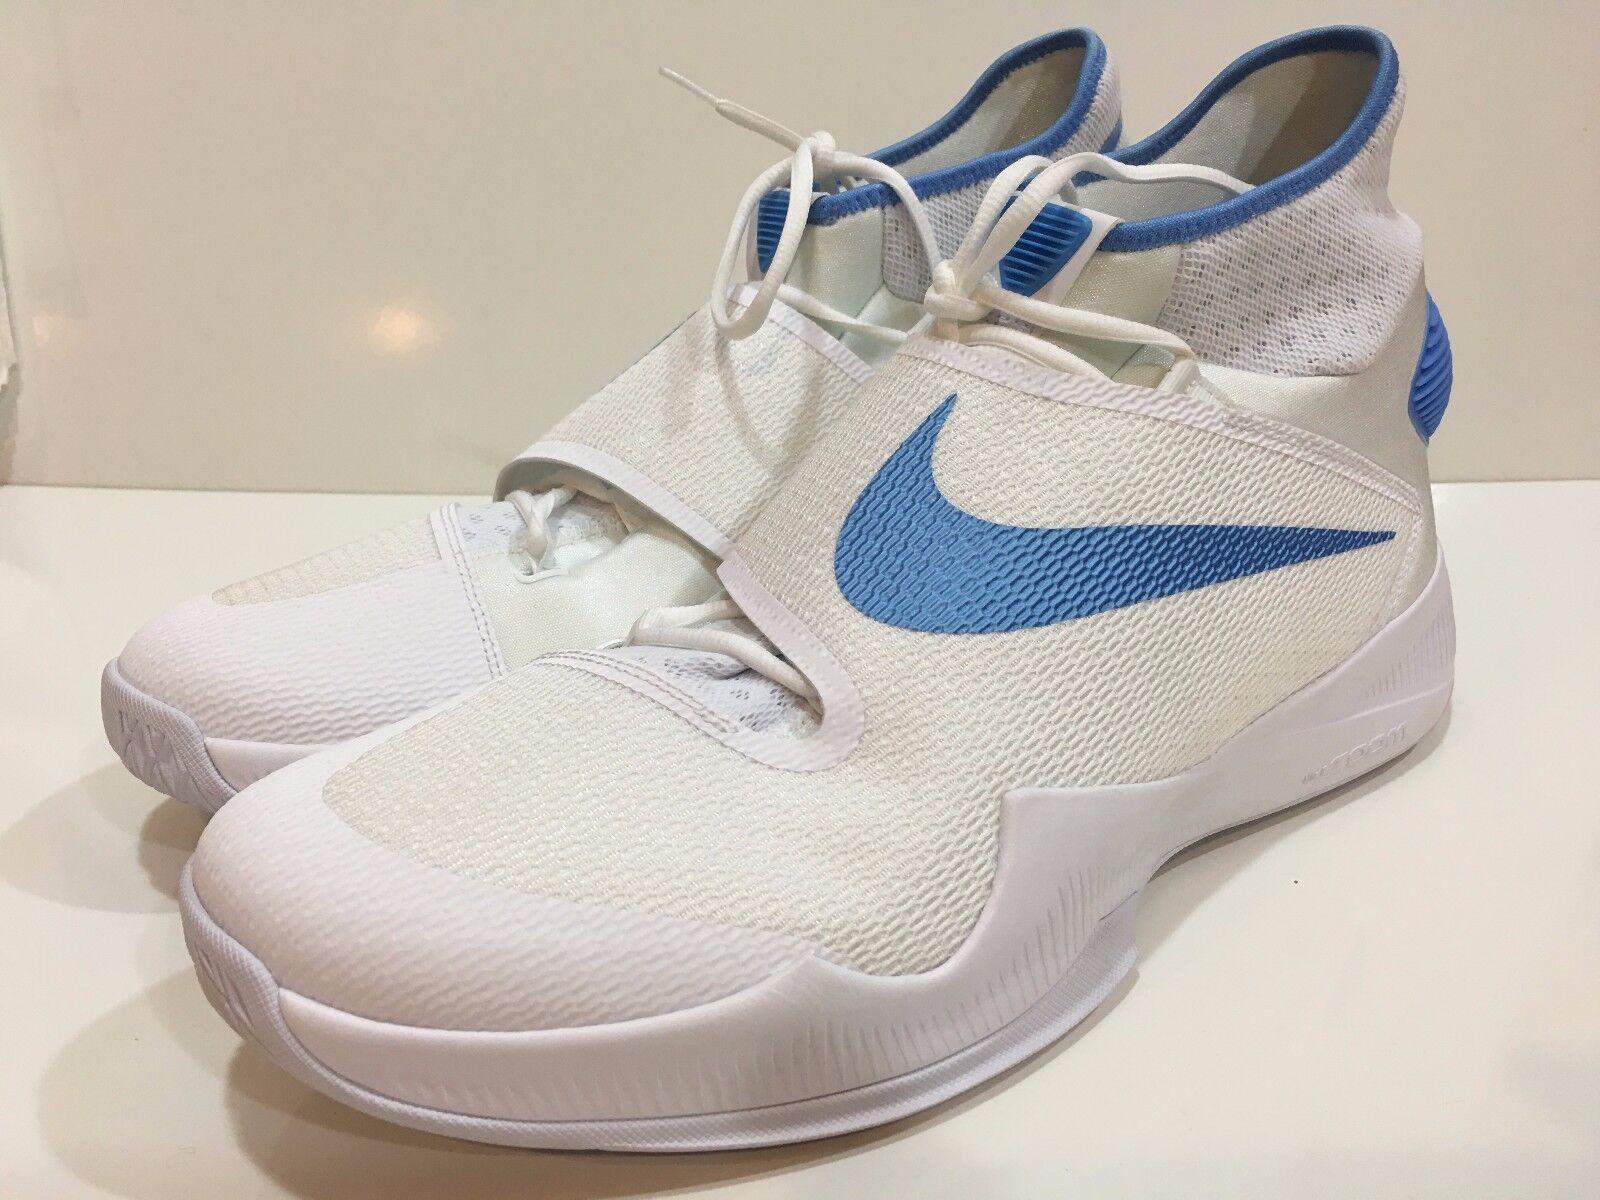 Nike Zoom Hyperrev Men's Basketball Athletic White / Blue Shoes Comfortable